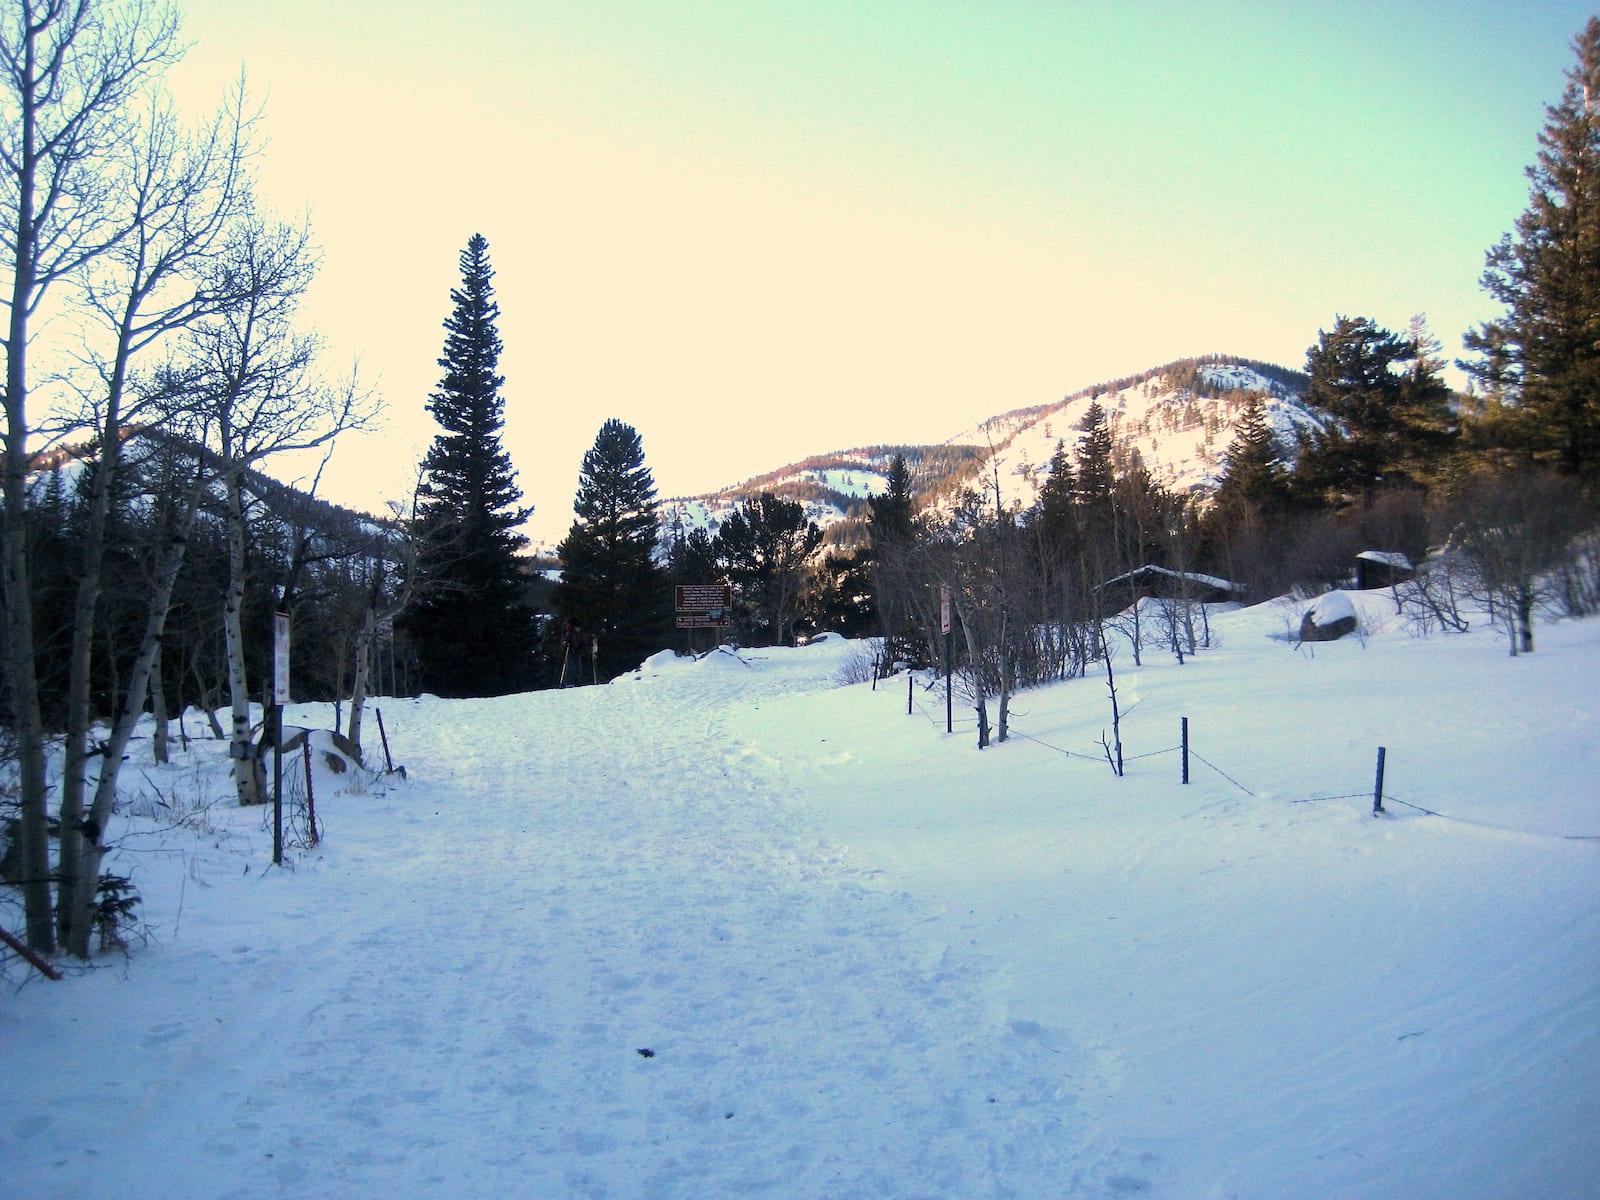 Hessie Trailhead Snowshoeing Trail Colorado